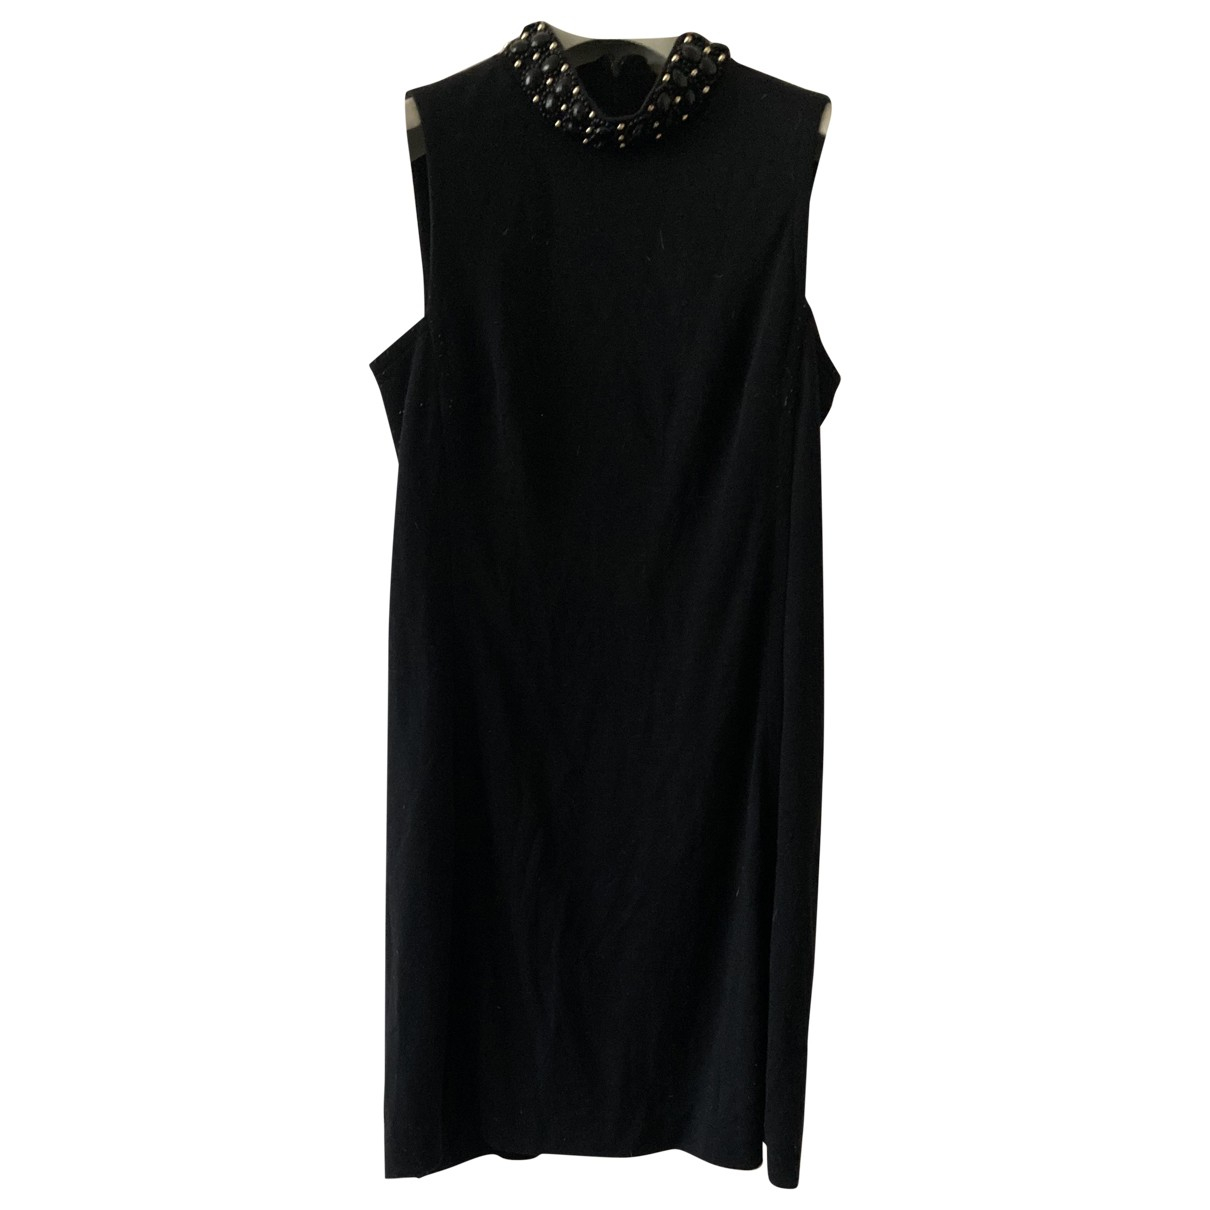 Milly N Black Wool dress for Women 6 US